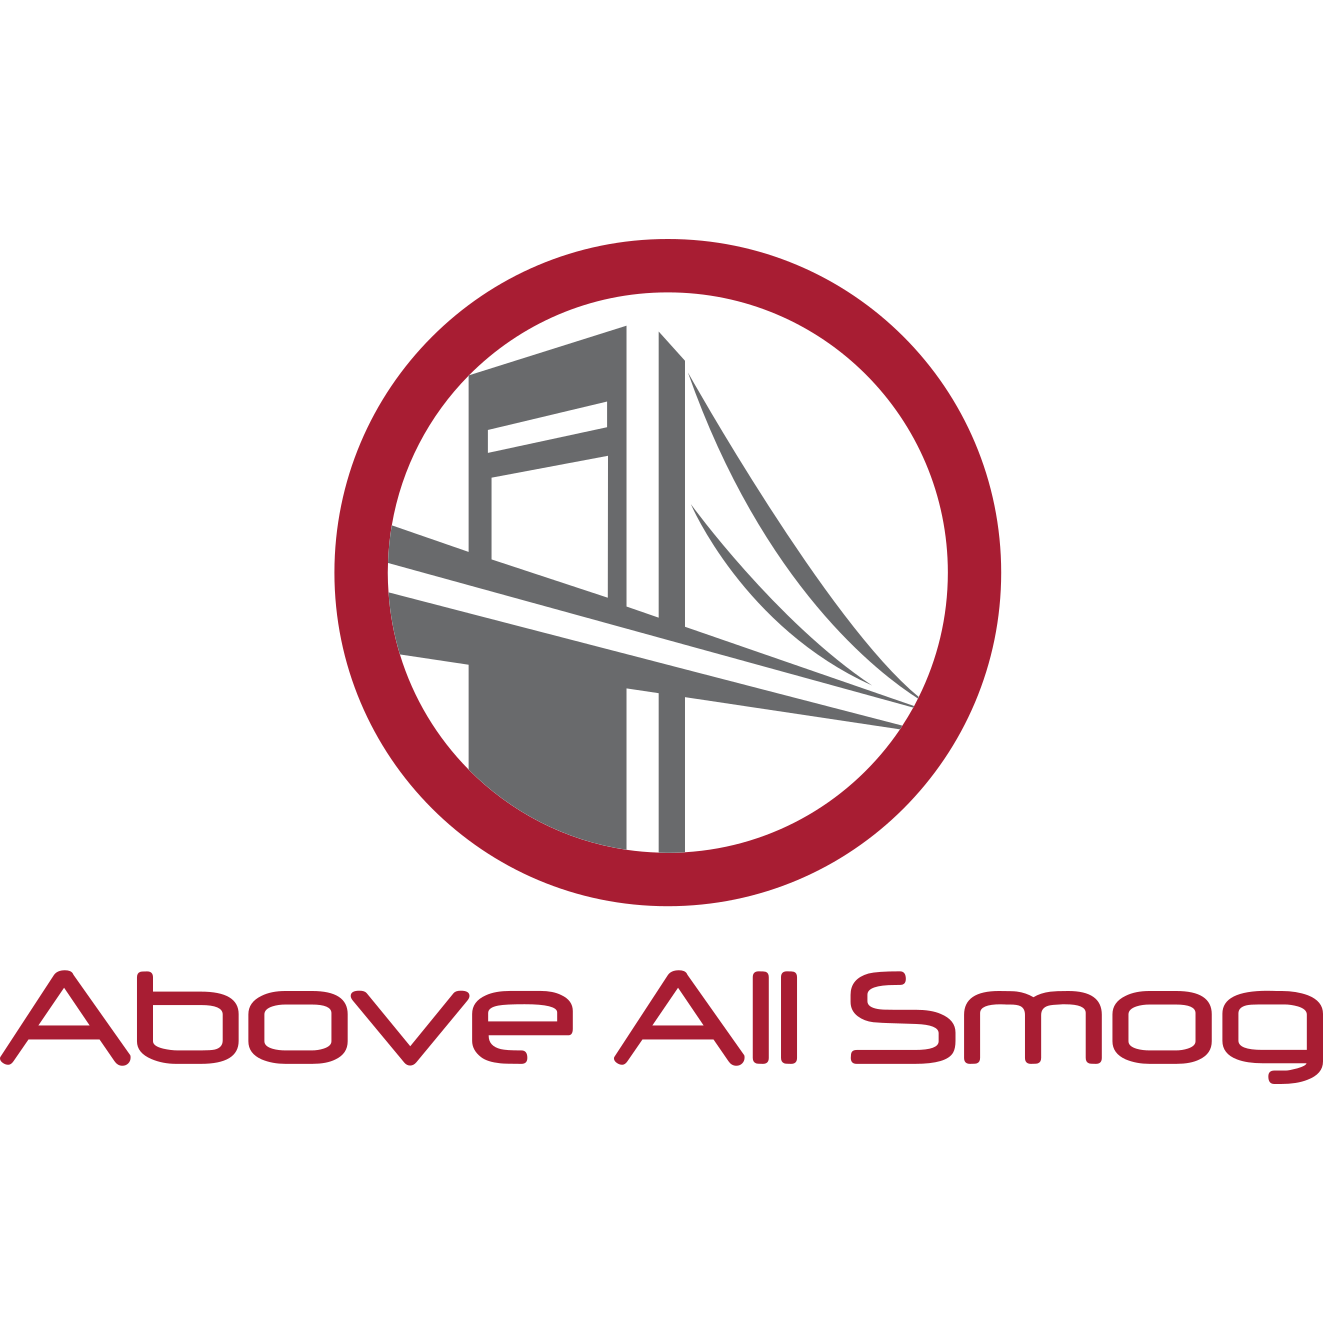 Above all smog